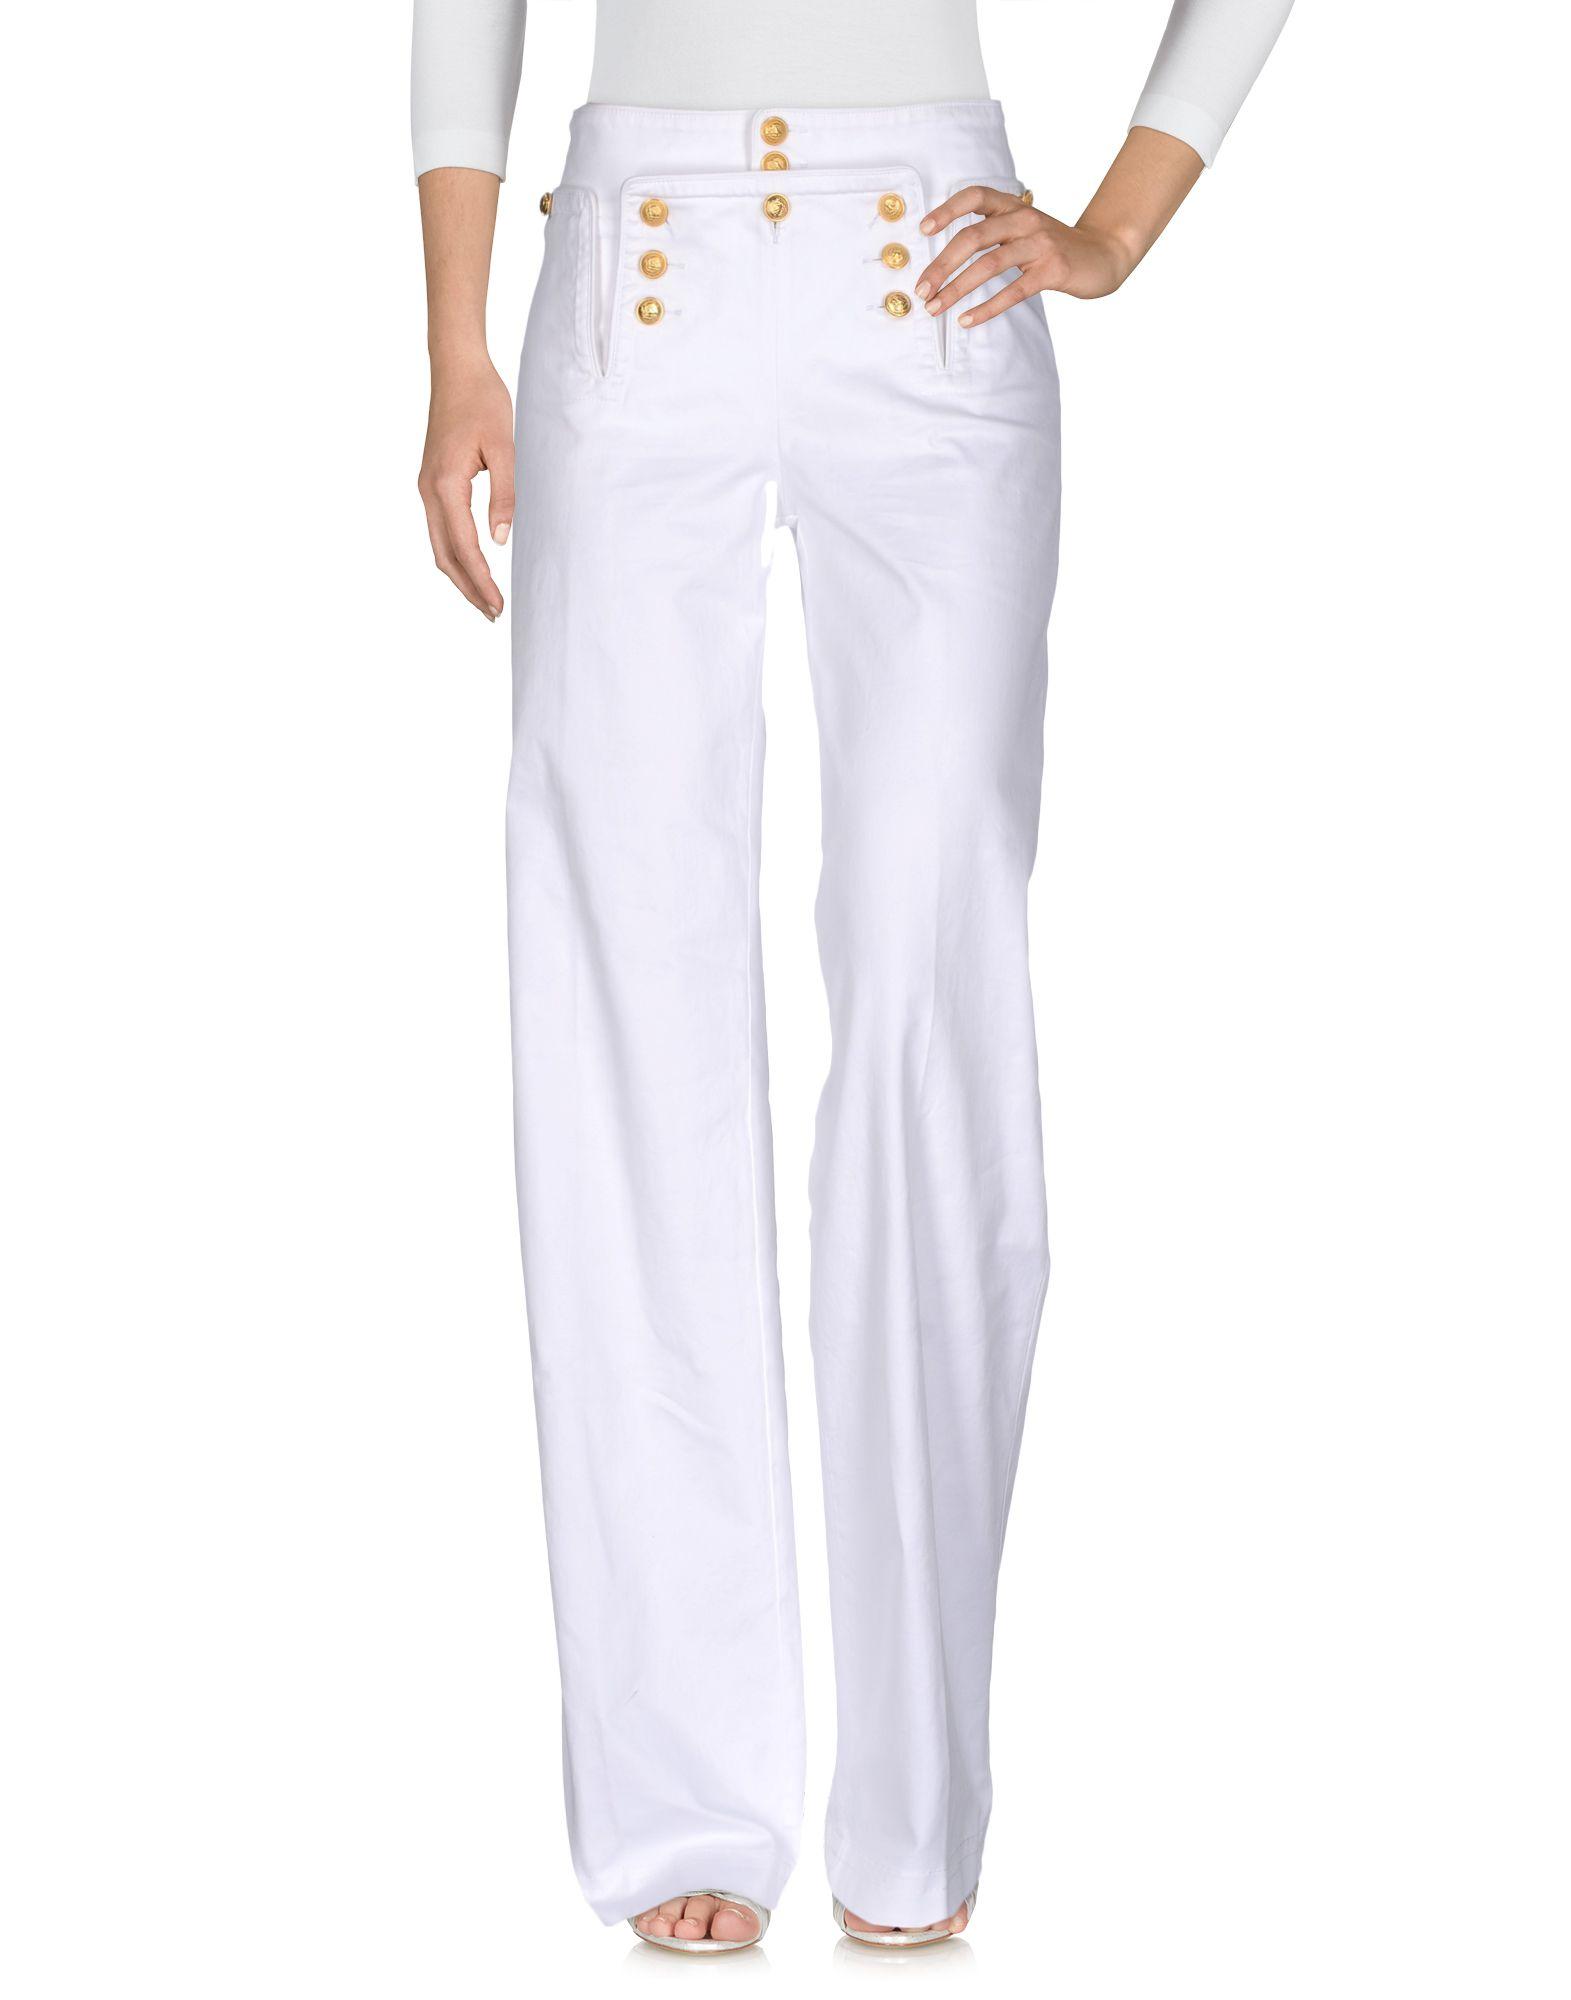 Pantaloni Jeans Dsquared2 Donna - Acquista online su IebB8fi